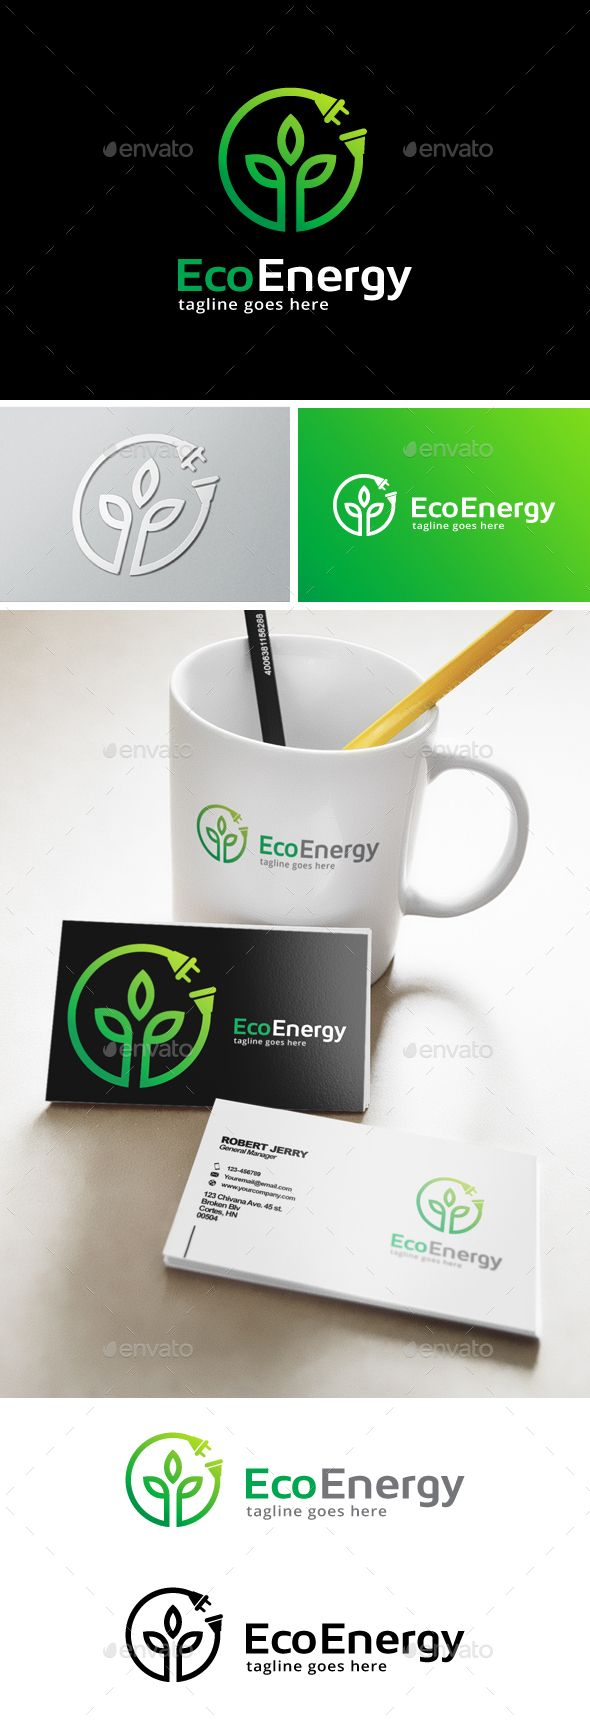 Green Energy Logo Template Transparent PNG, Vector EPS, AI Illustrator #logotype Download here: http://graphicriver.net/item/green-energy-logo/14145782?ref=ksioks